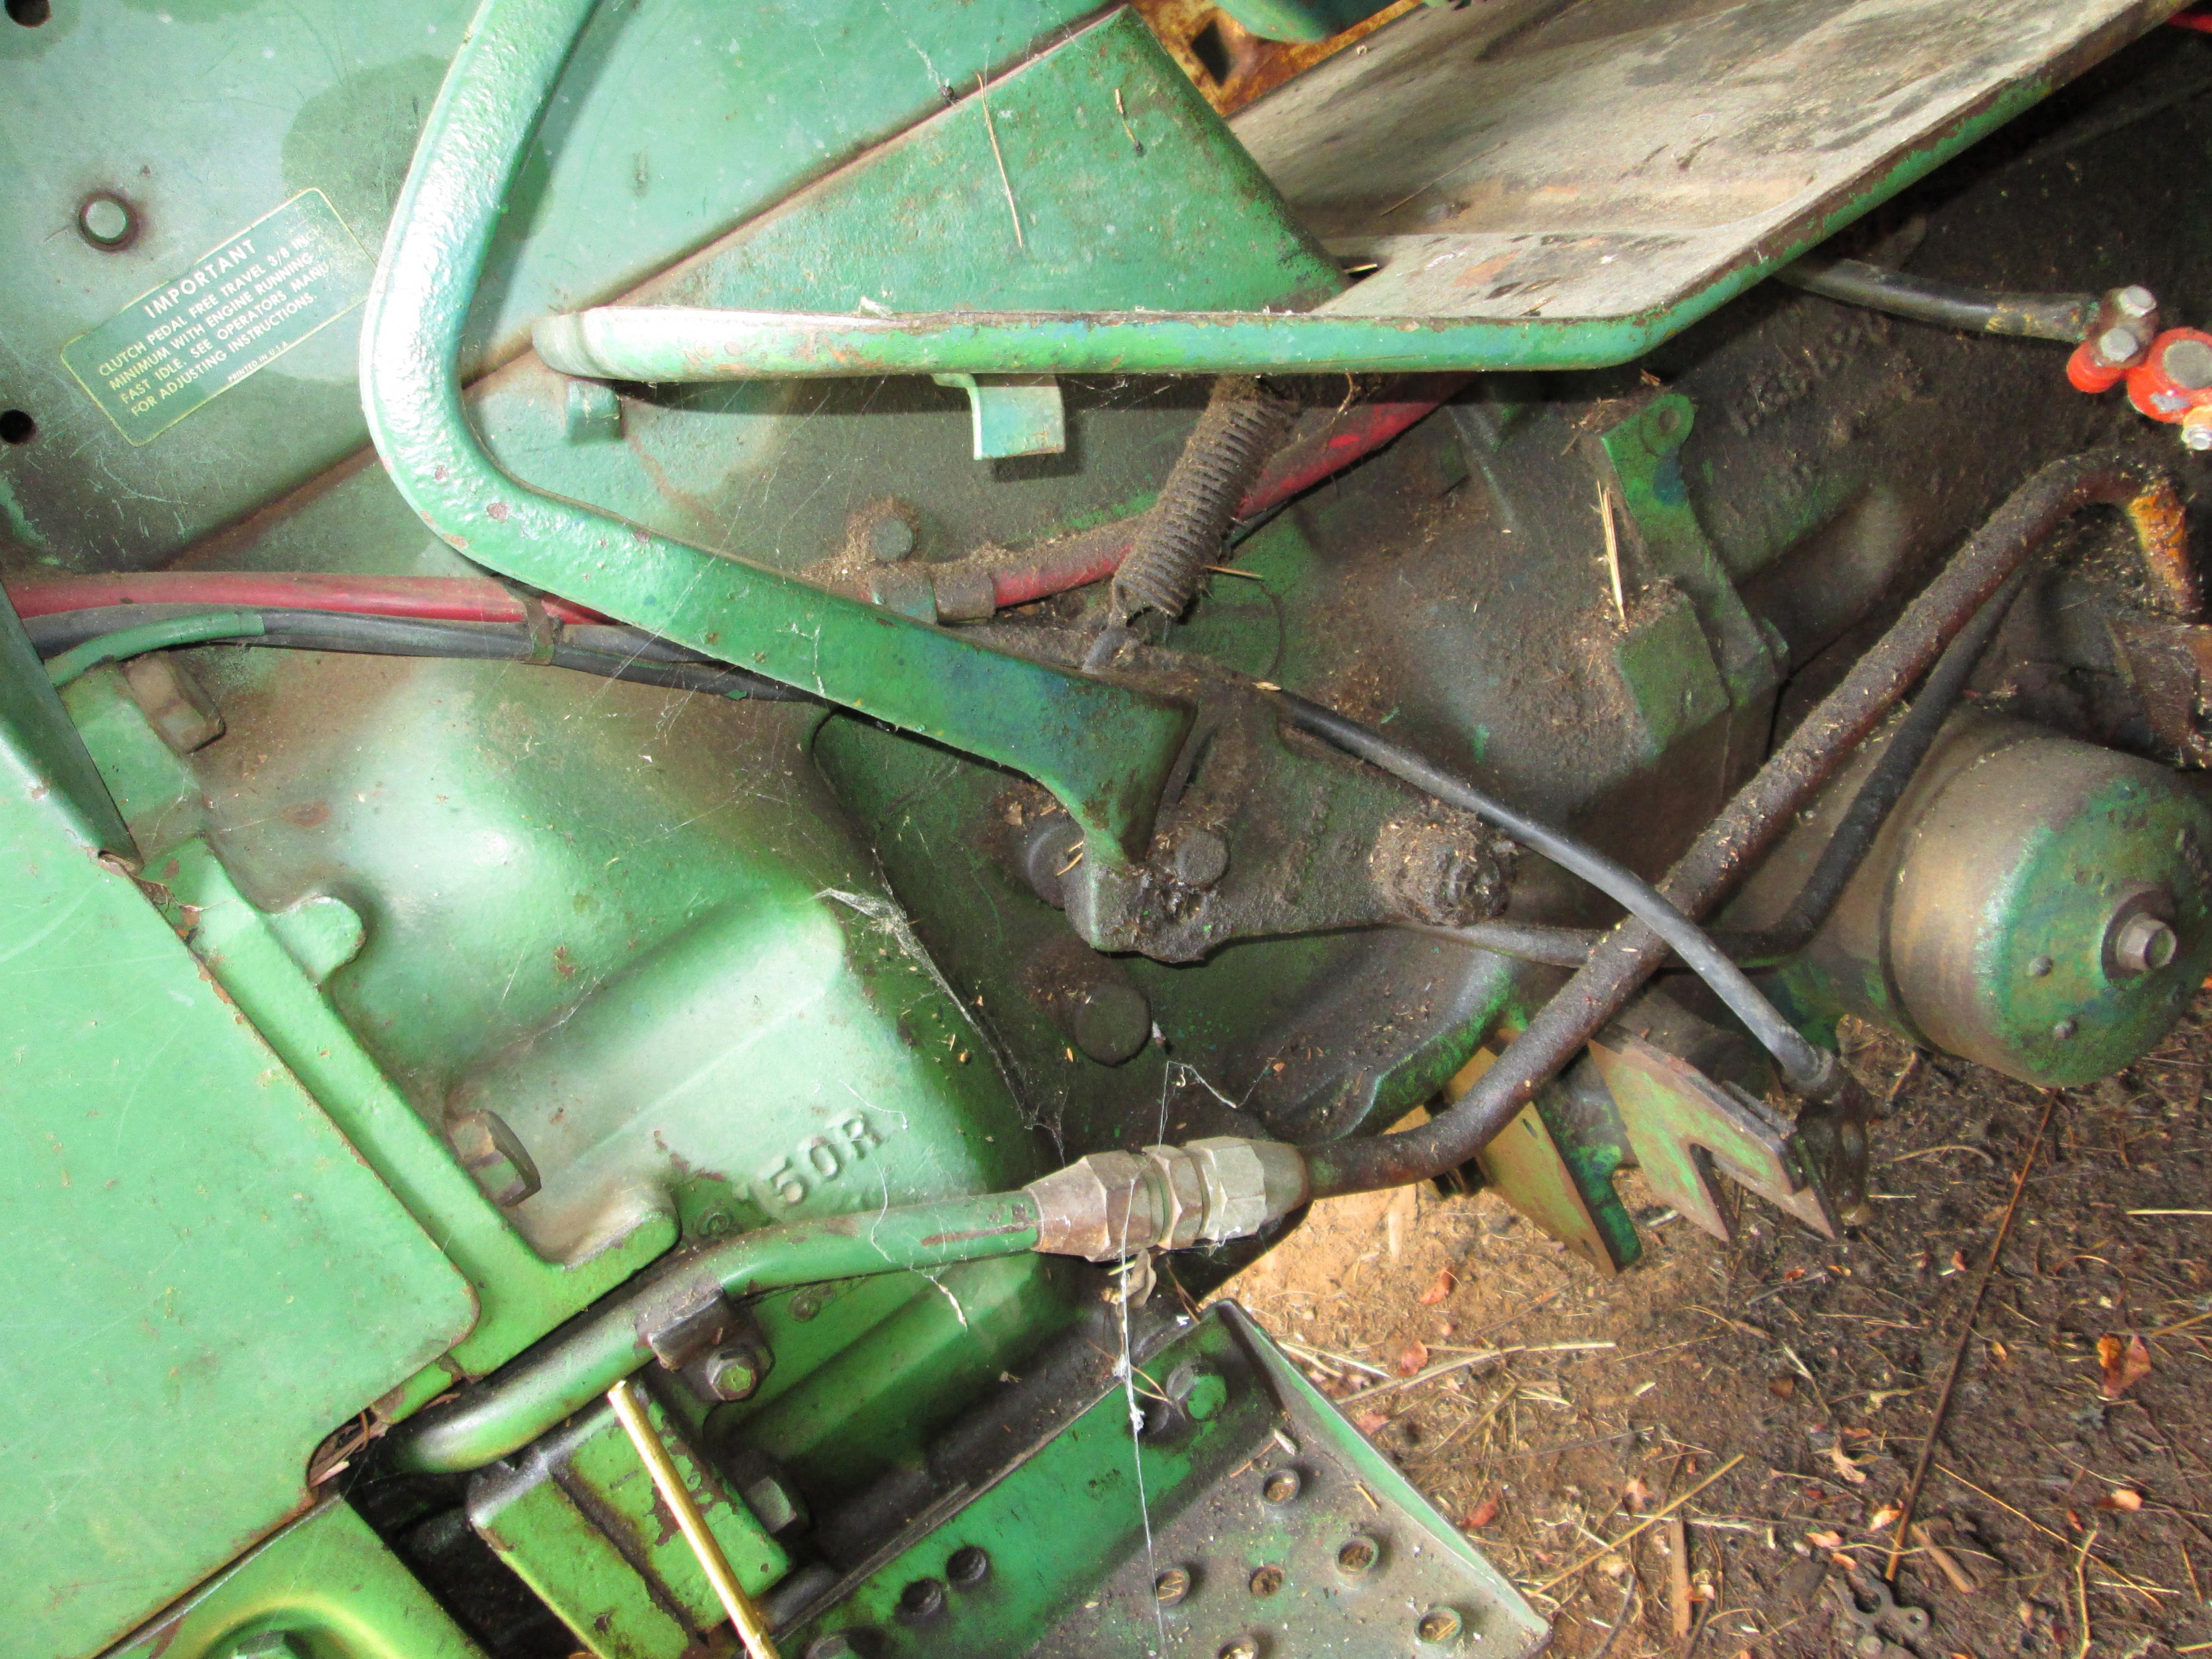 John Deere 3020 sel 24V Electrical System | Green Tractor ... on